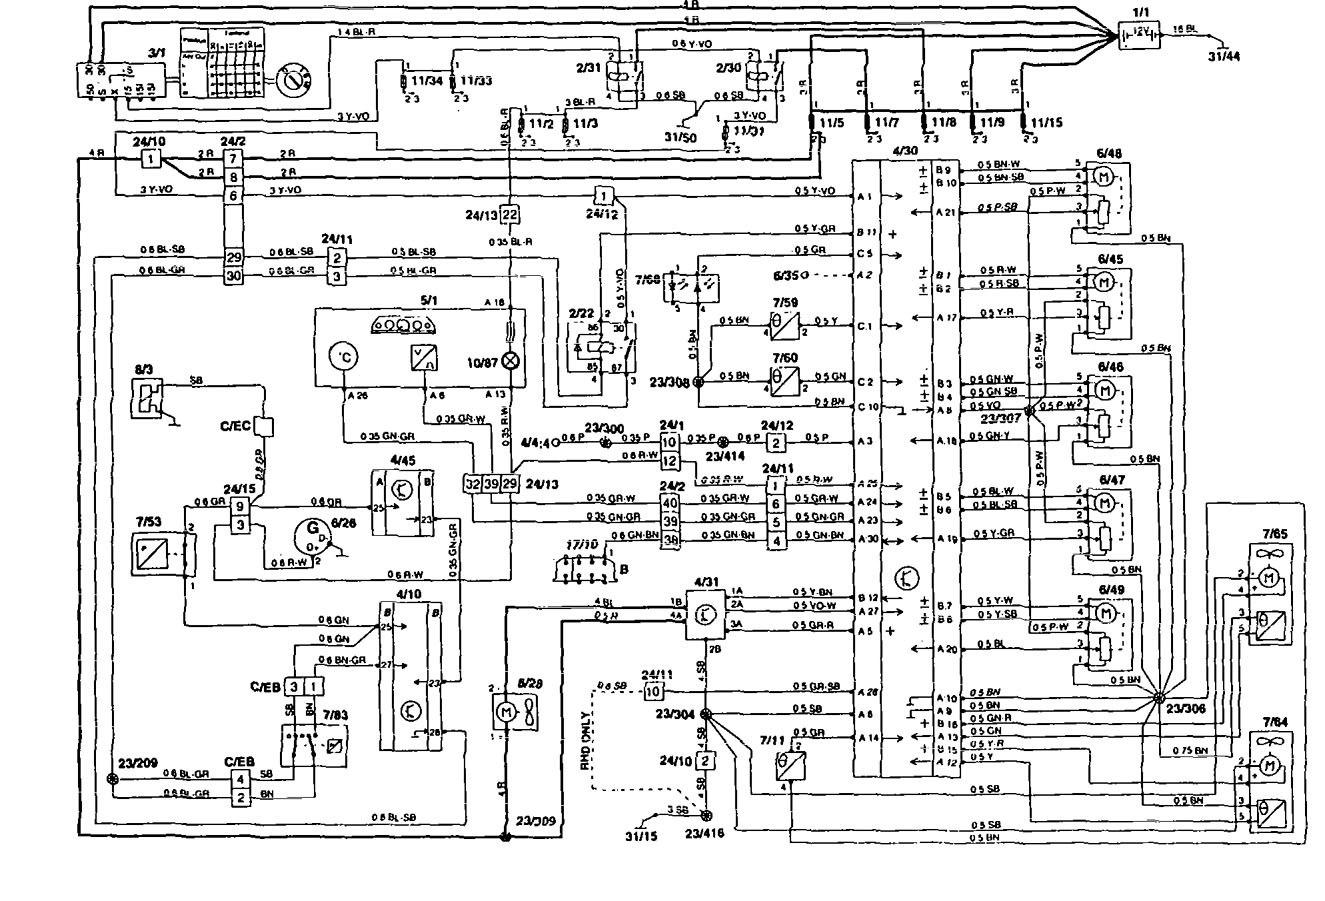 Rv 4959  Volvo 850 Turbo Vacuum Diagram 1995 Volvo 850 Auto Engine And Wiring Diagram